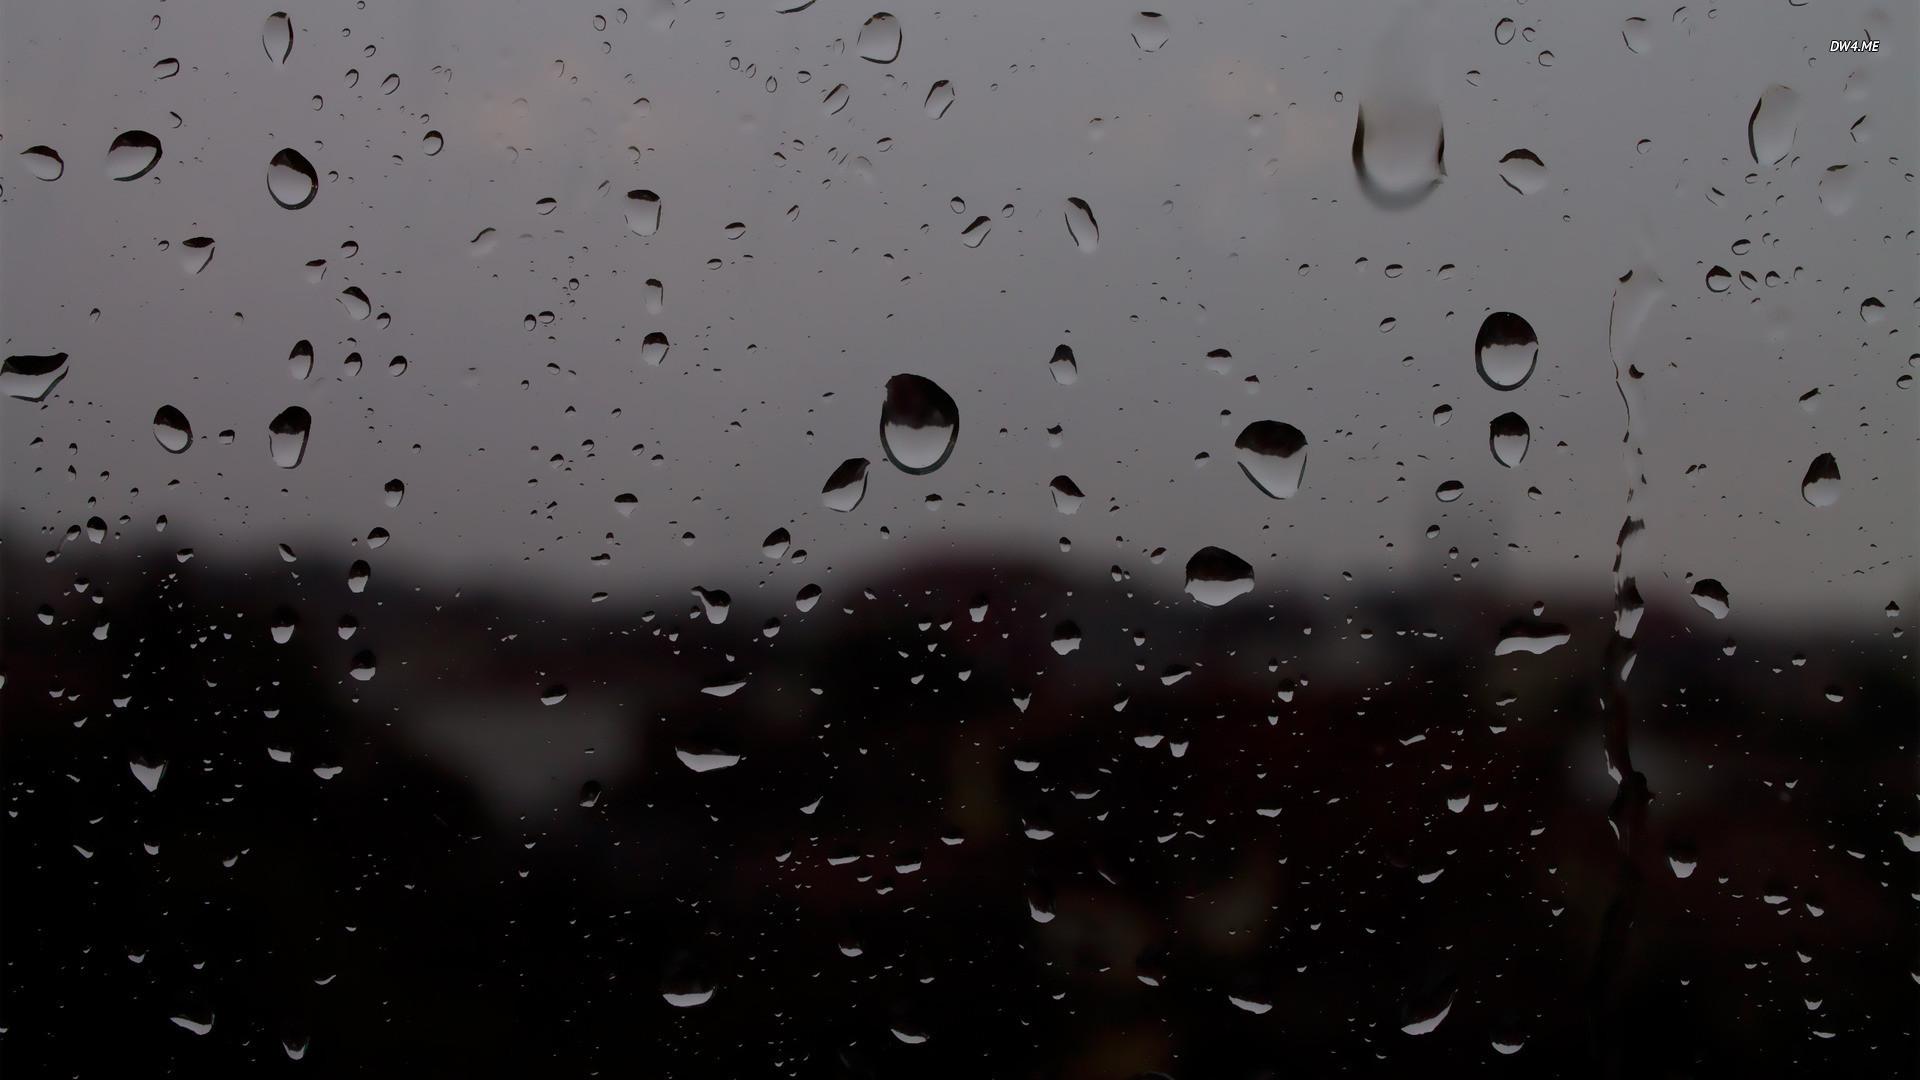 Raindrops And Clouds Wallpaper Raindrop Wallpapers